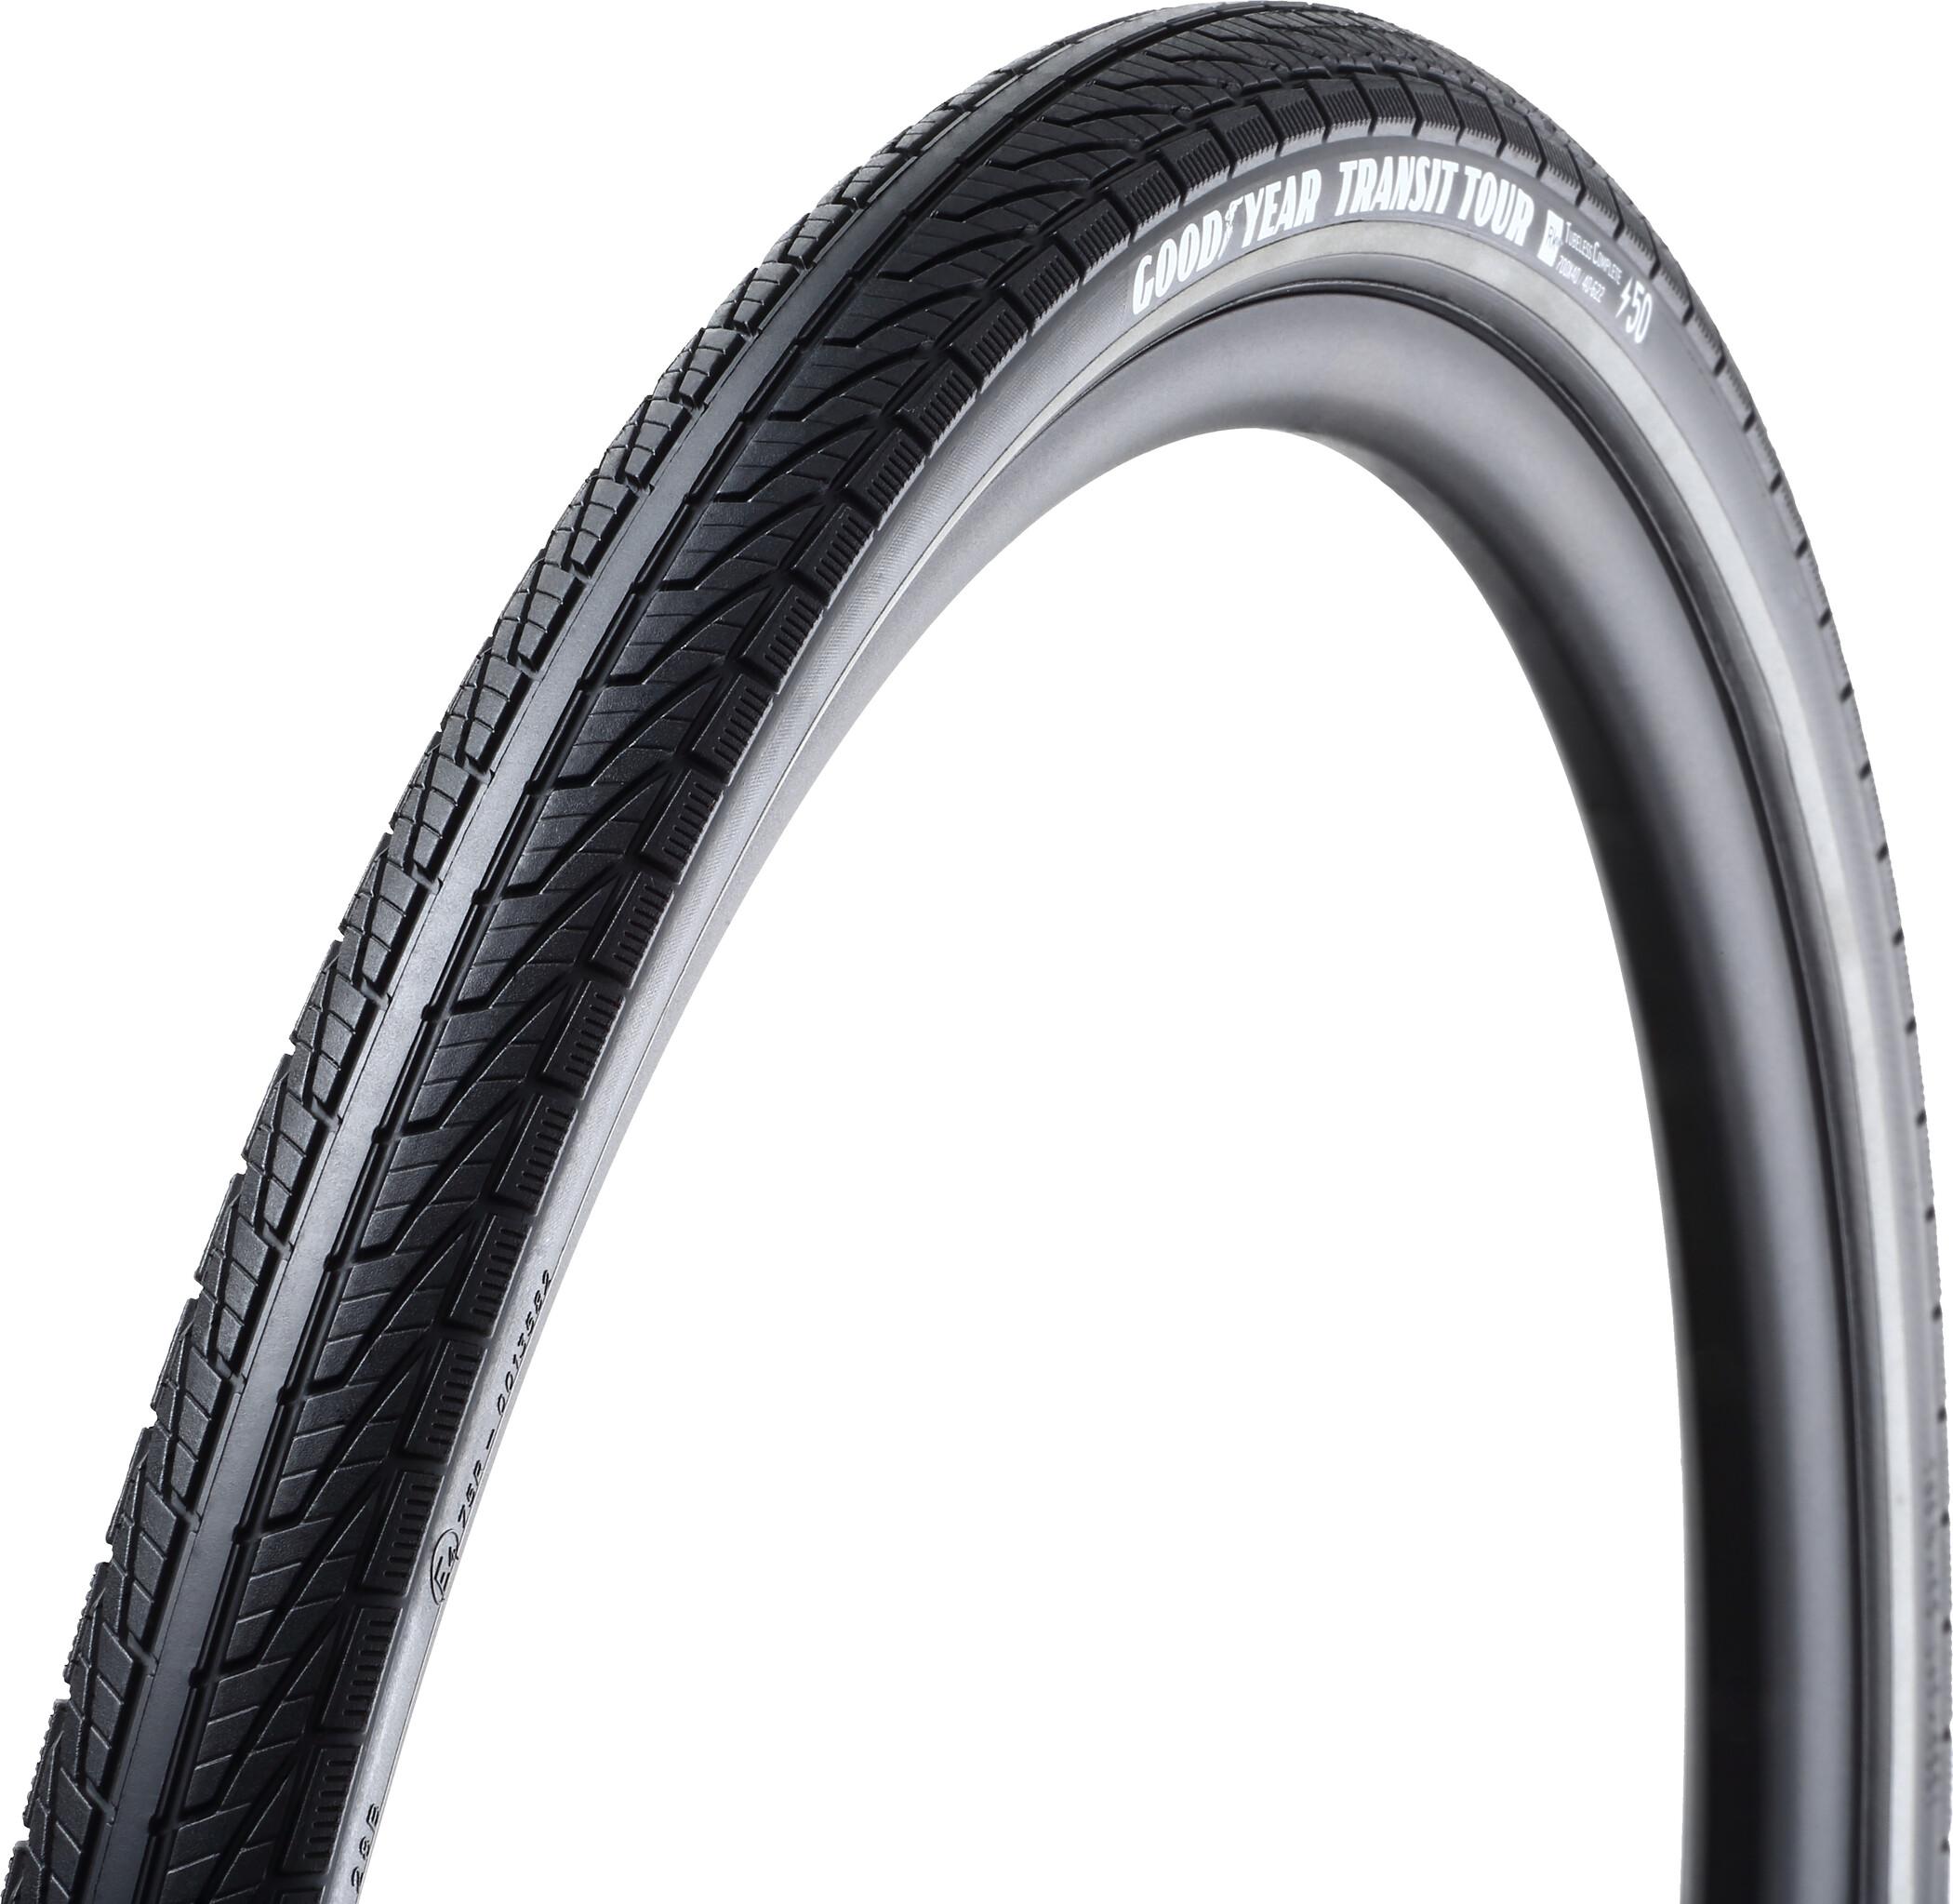 Goodyear Transit Tour Dæk 40-622 S3 Shell RT e50, black reflected (2019) | Tyres